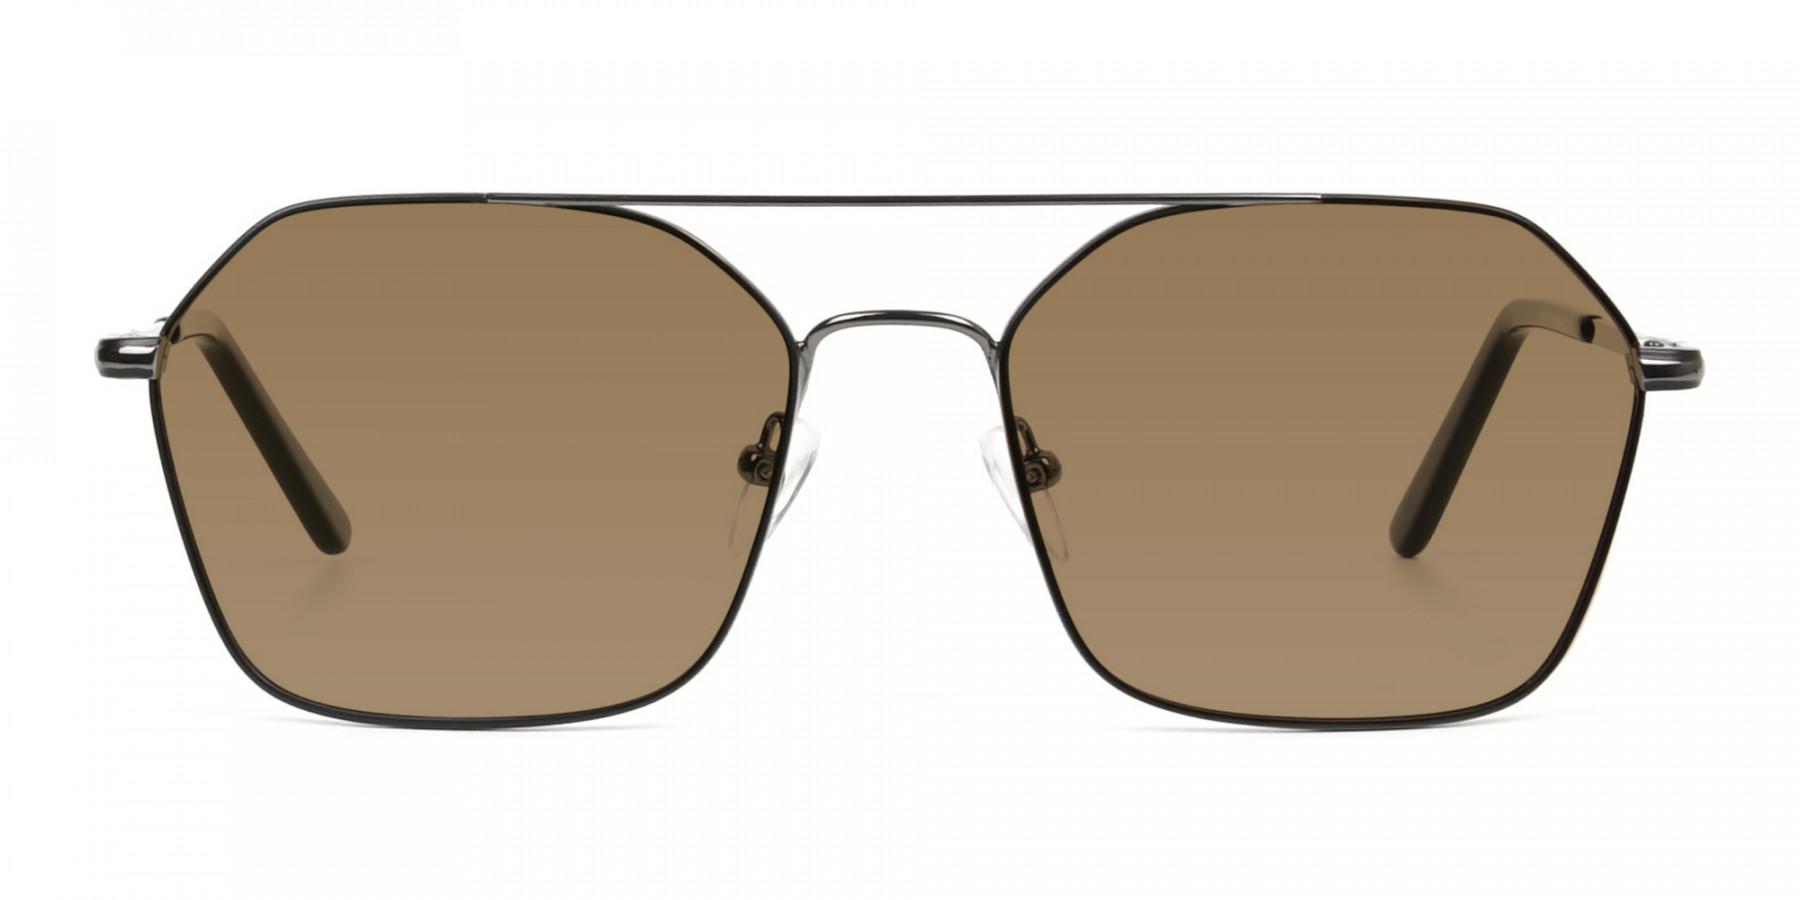 black-gunmetal-geometric-aviator-brown-tinted-sunglasses-frames-3